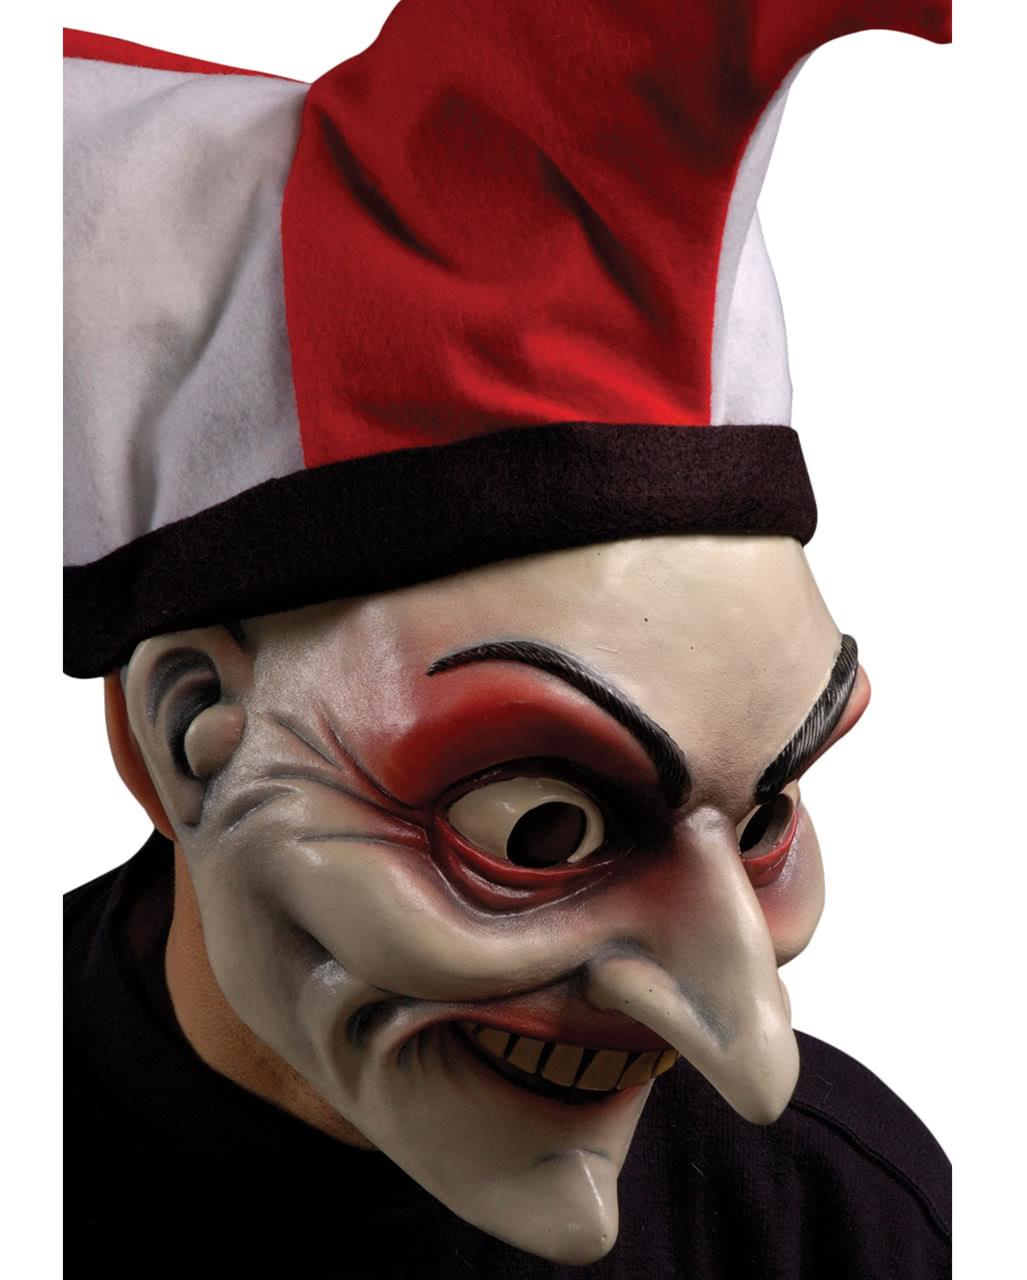 Joker killerclown mask For Halloween | horror-shop.com